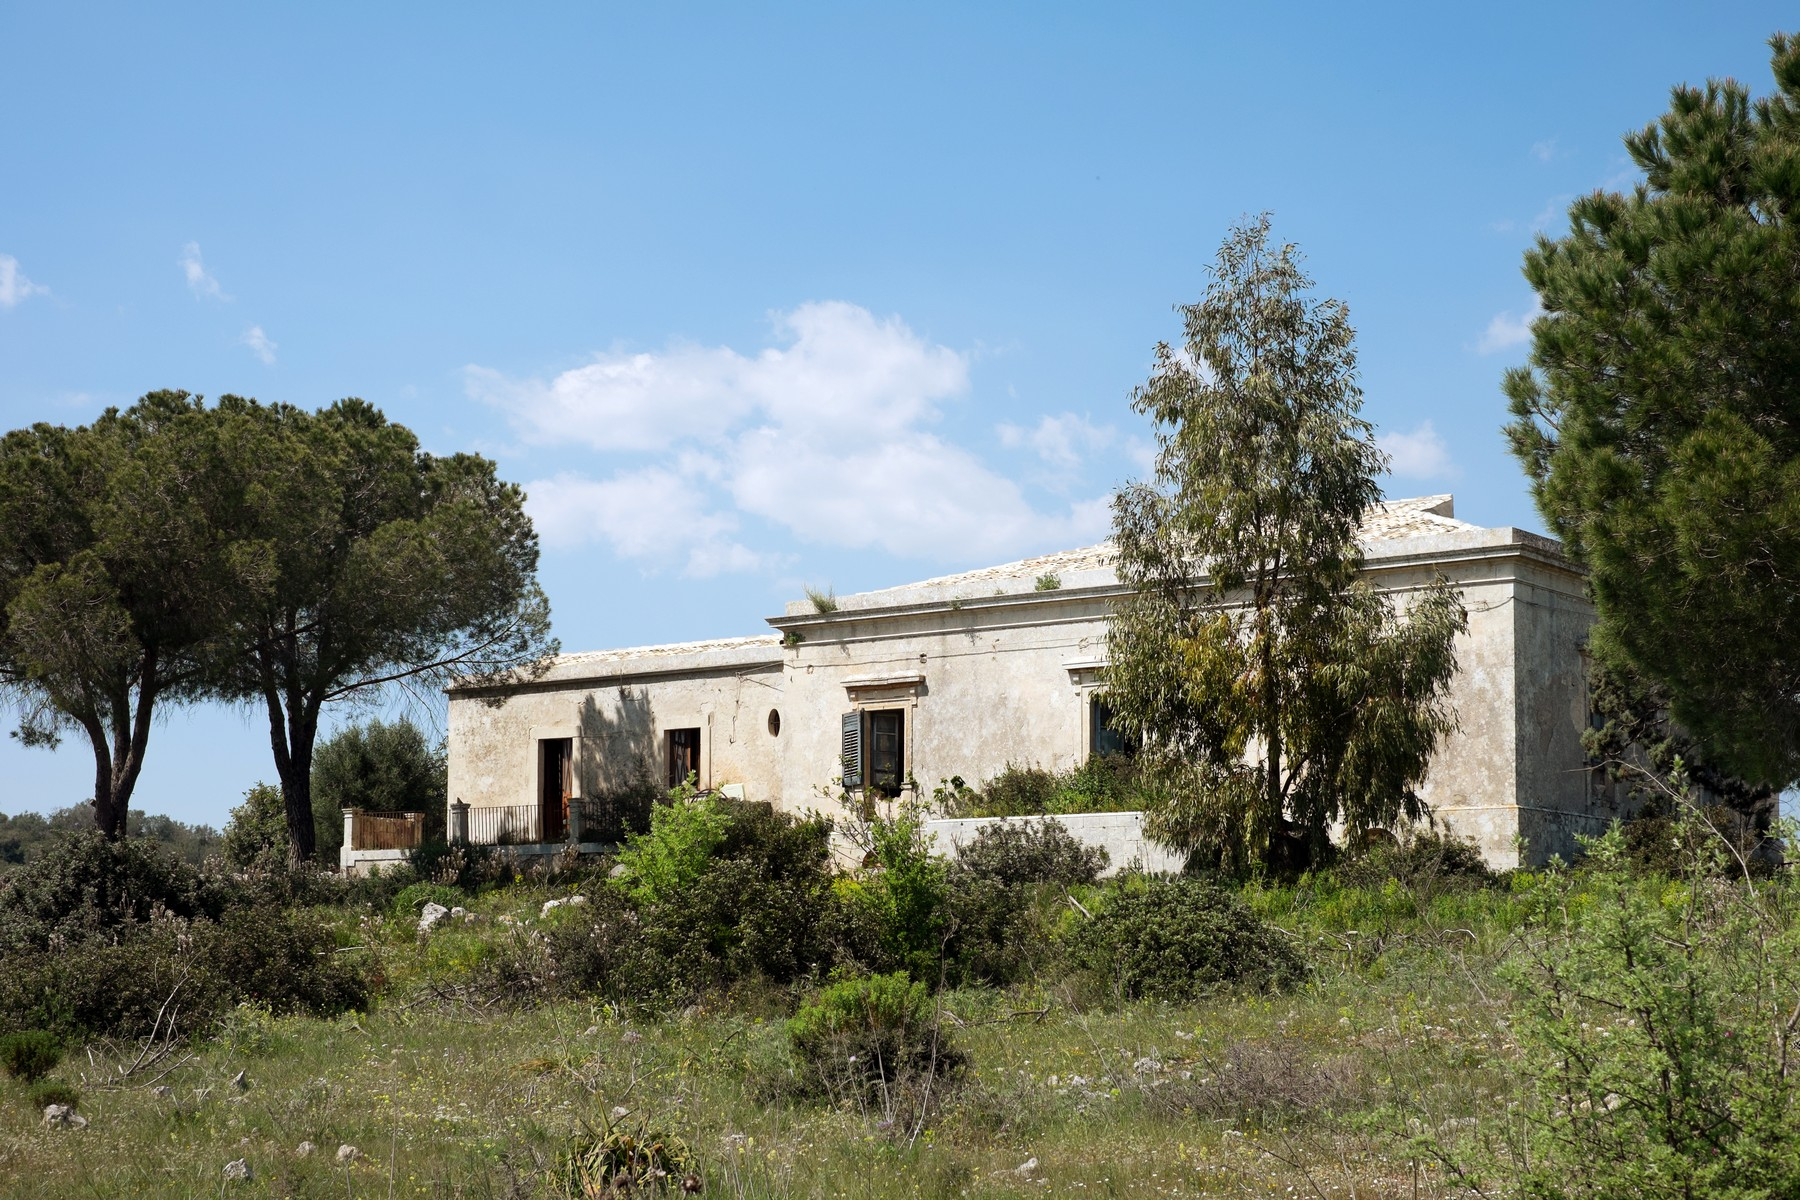 Casa indipendente in Vendita a Noto: 5 locali, 1000 mq - Foto 1